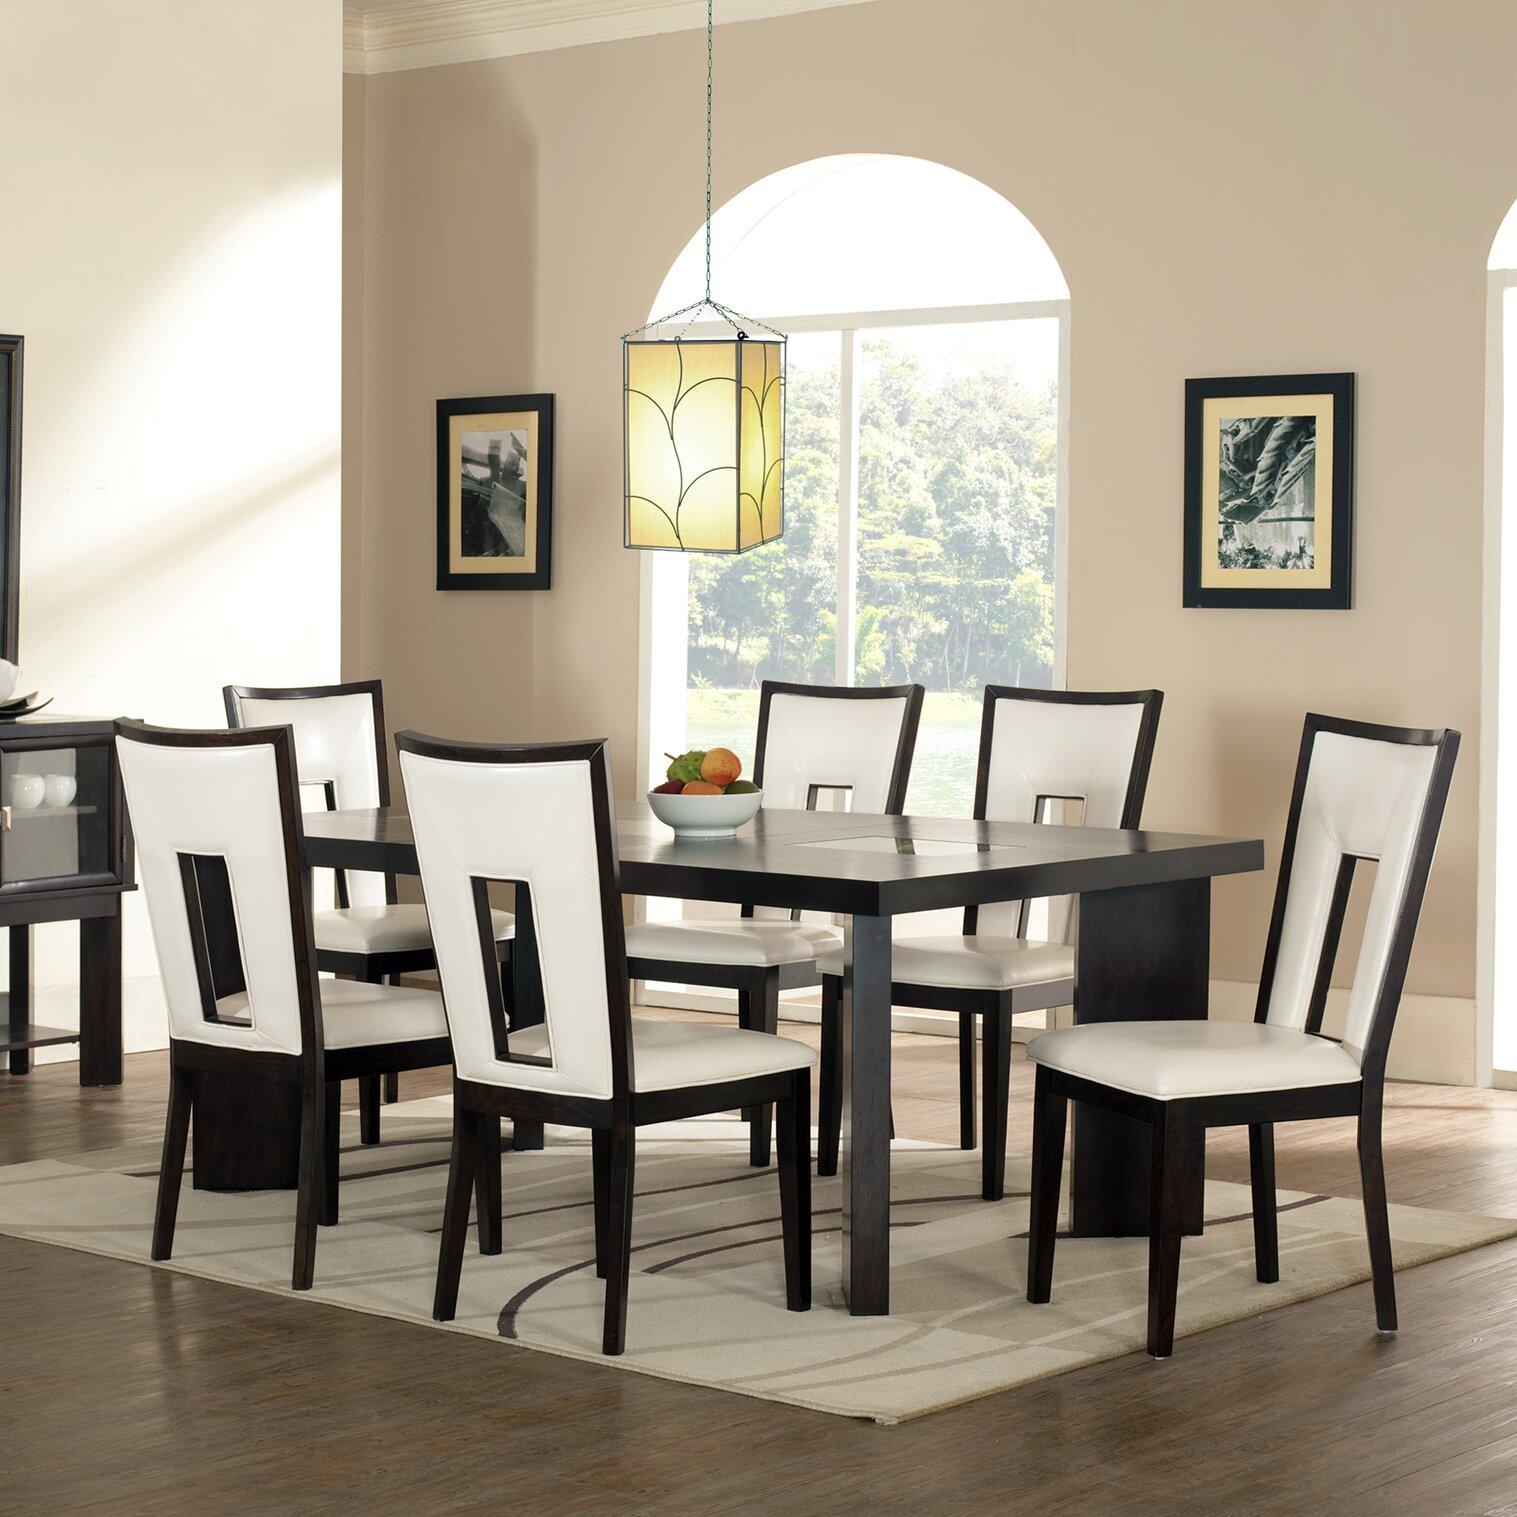 Steve Silver Leona 9 Piece Dining Table Set: Steve Silver Furniture Delano 7 Piece Dining Set & Reviews